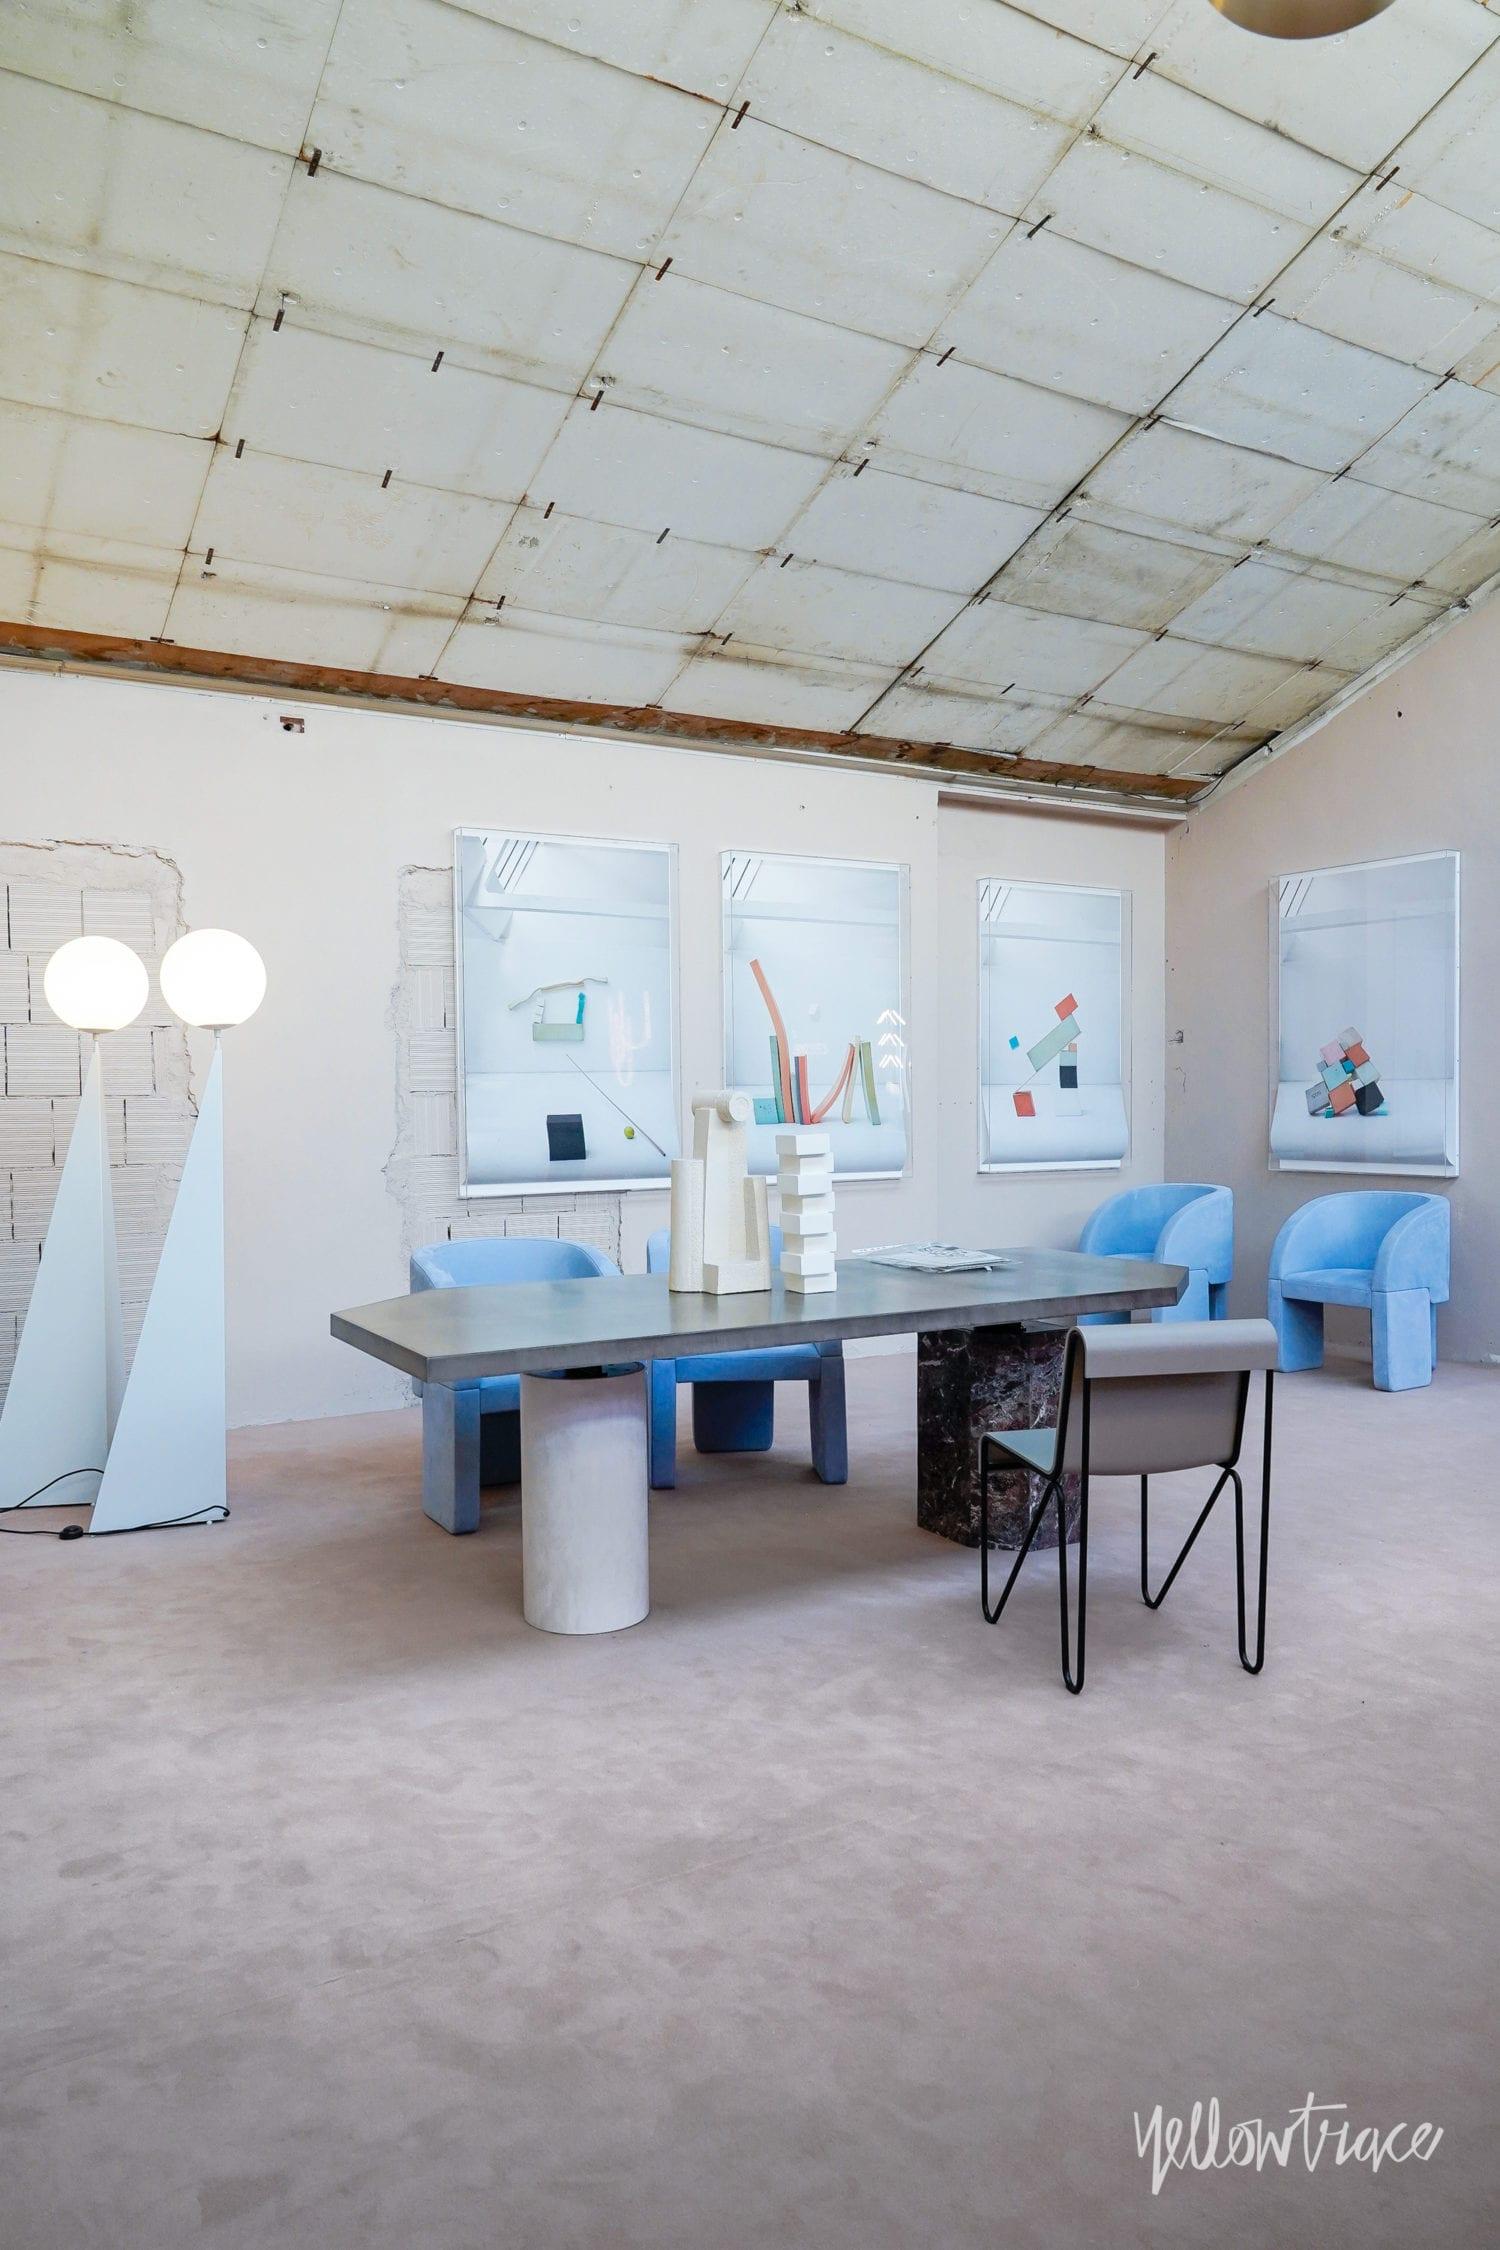 Les Arcanistes Studiopepe At Milan Design Week 2019 Photo Nick Hughes Yellowtrace 07c